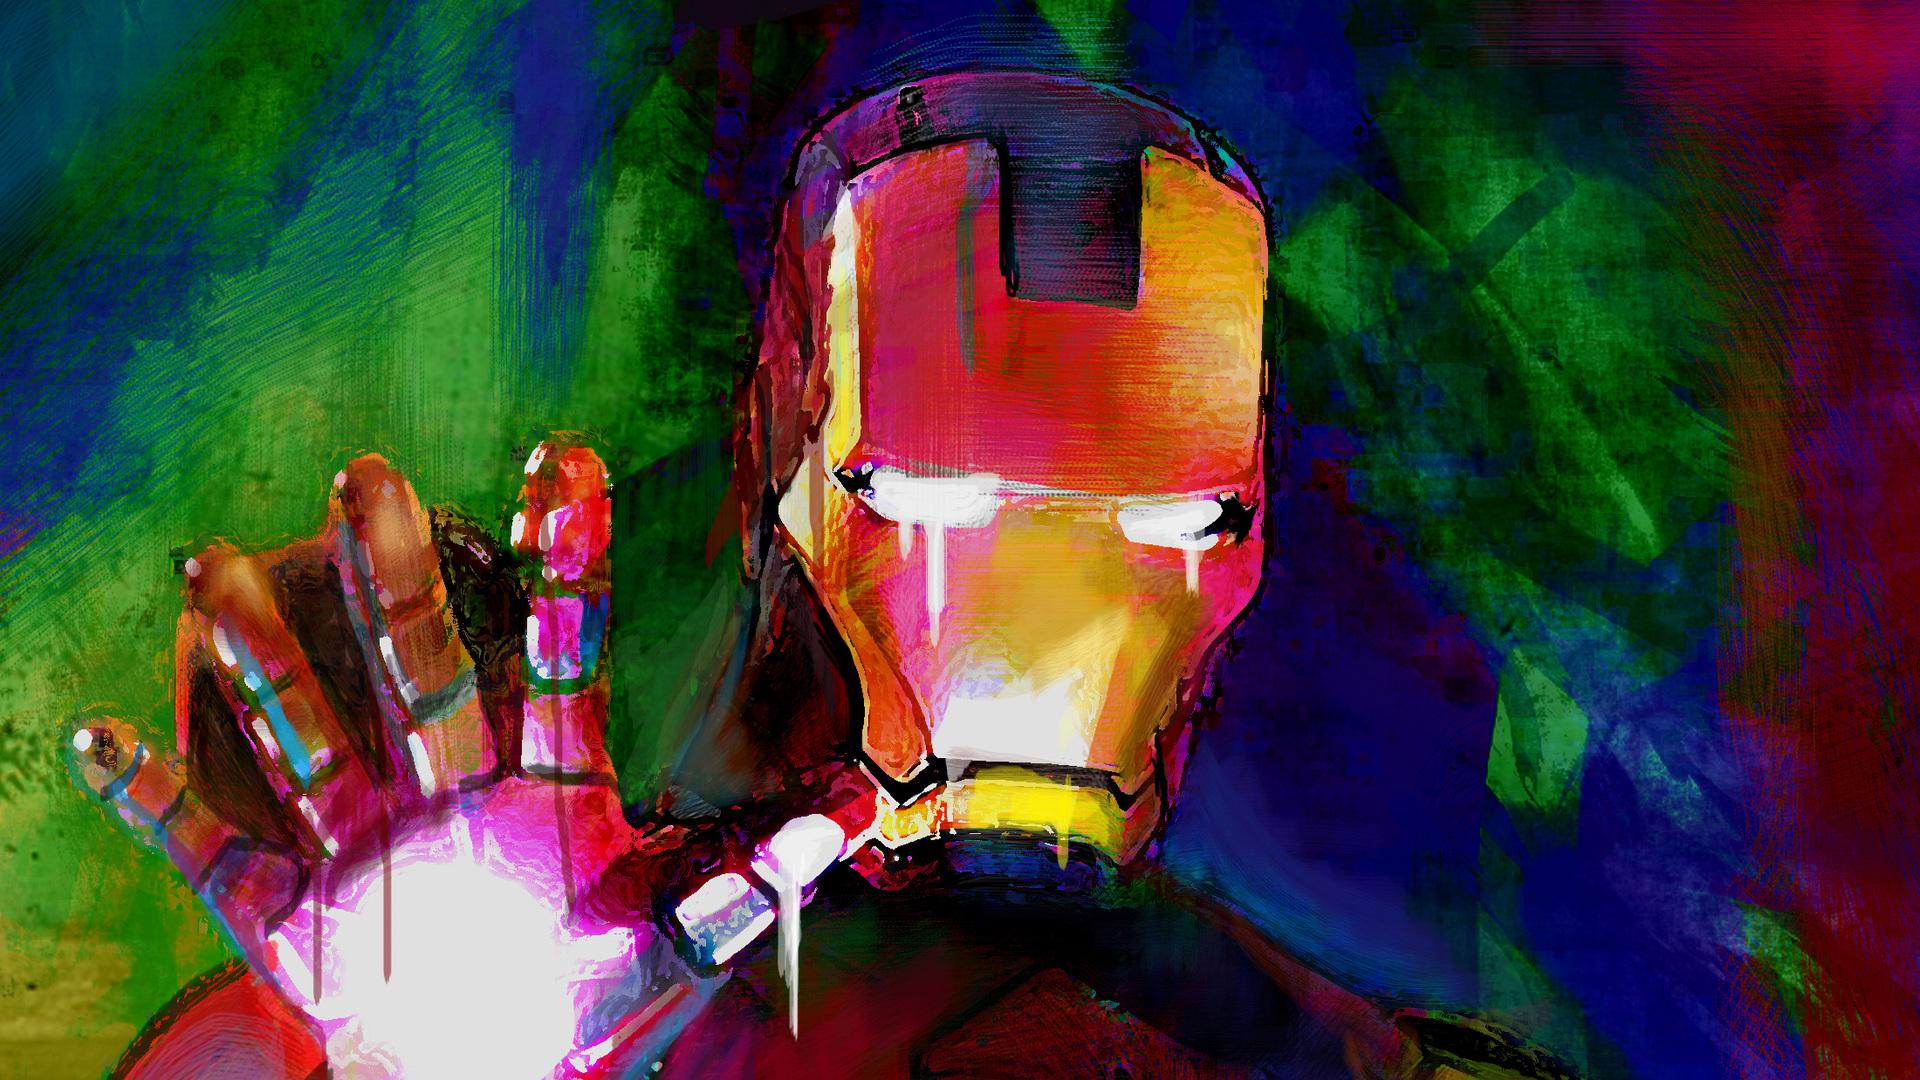 Iron Man Paint Color Art Laptop Full HD 1080P HD